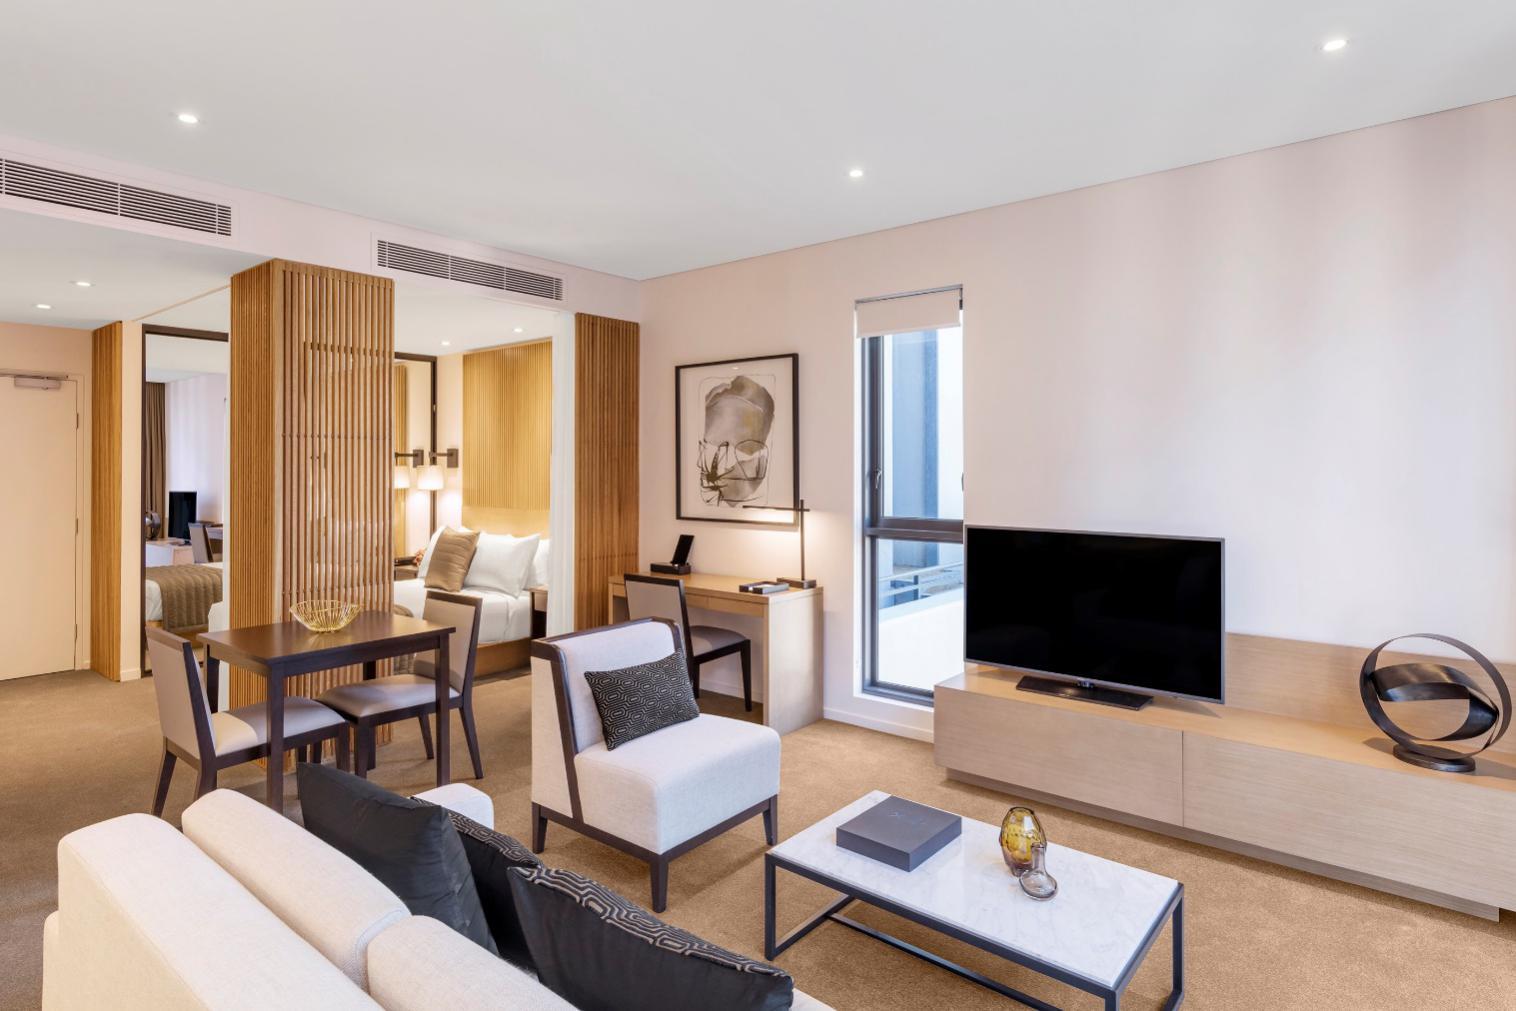 SKYE套房酒店正式推出长住客房,全新酒店开业在即